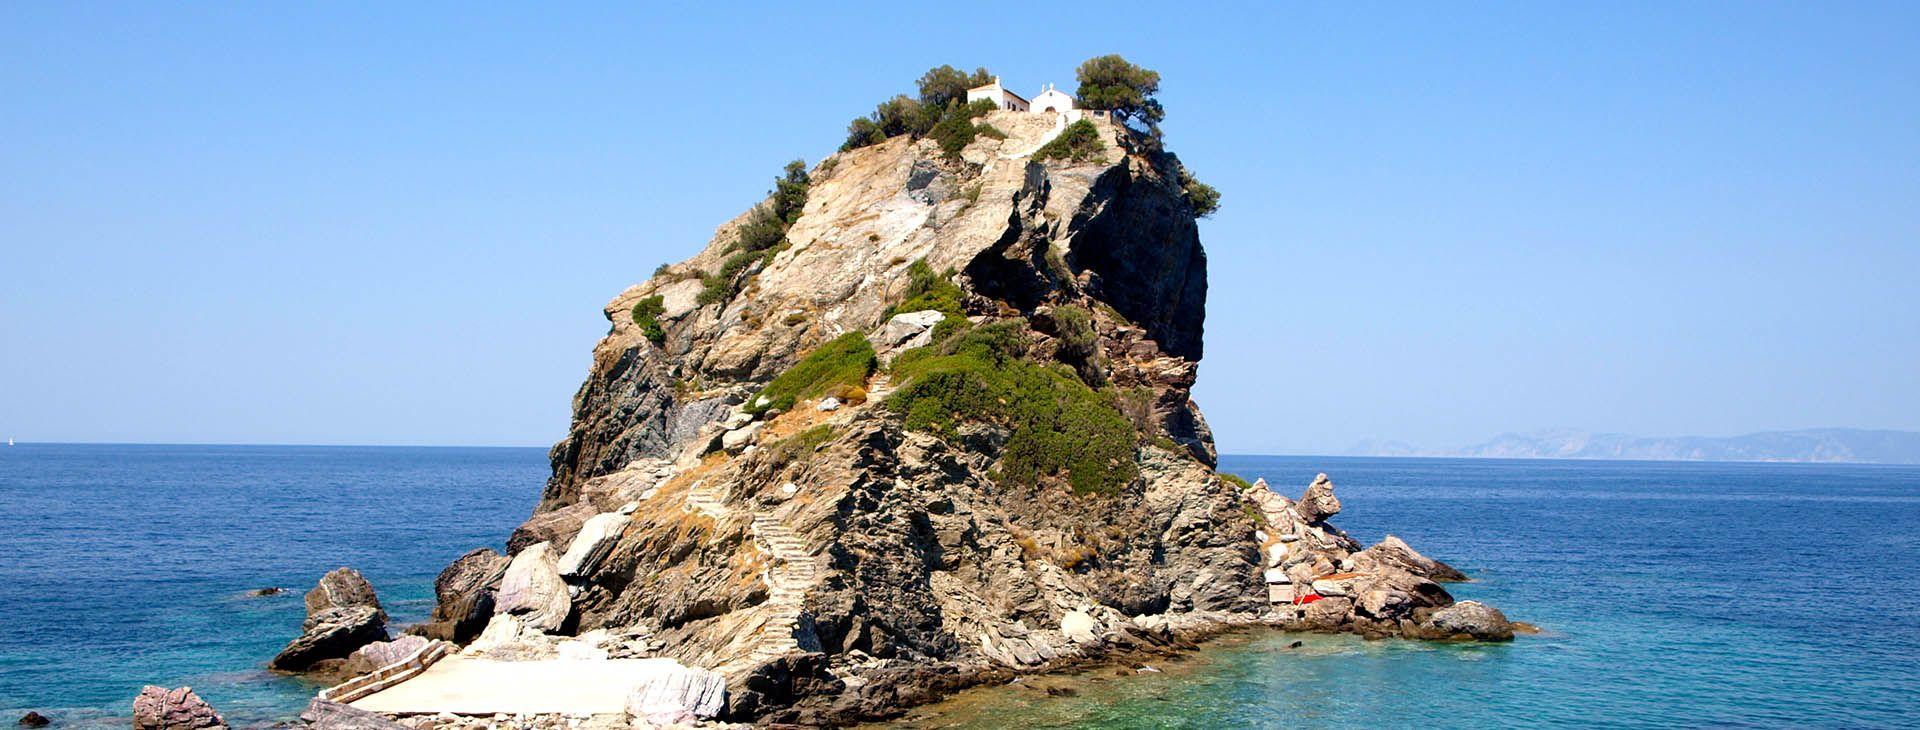 Biserica Agios Ioannis - Skopelos